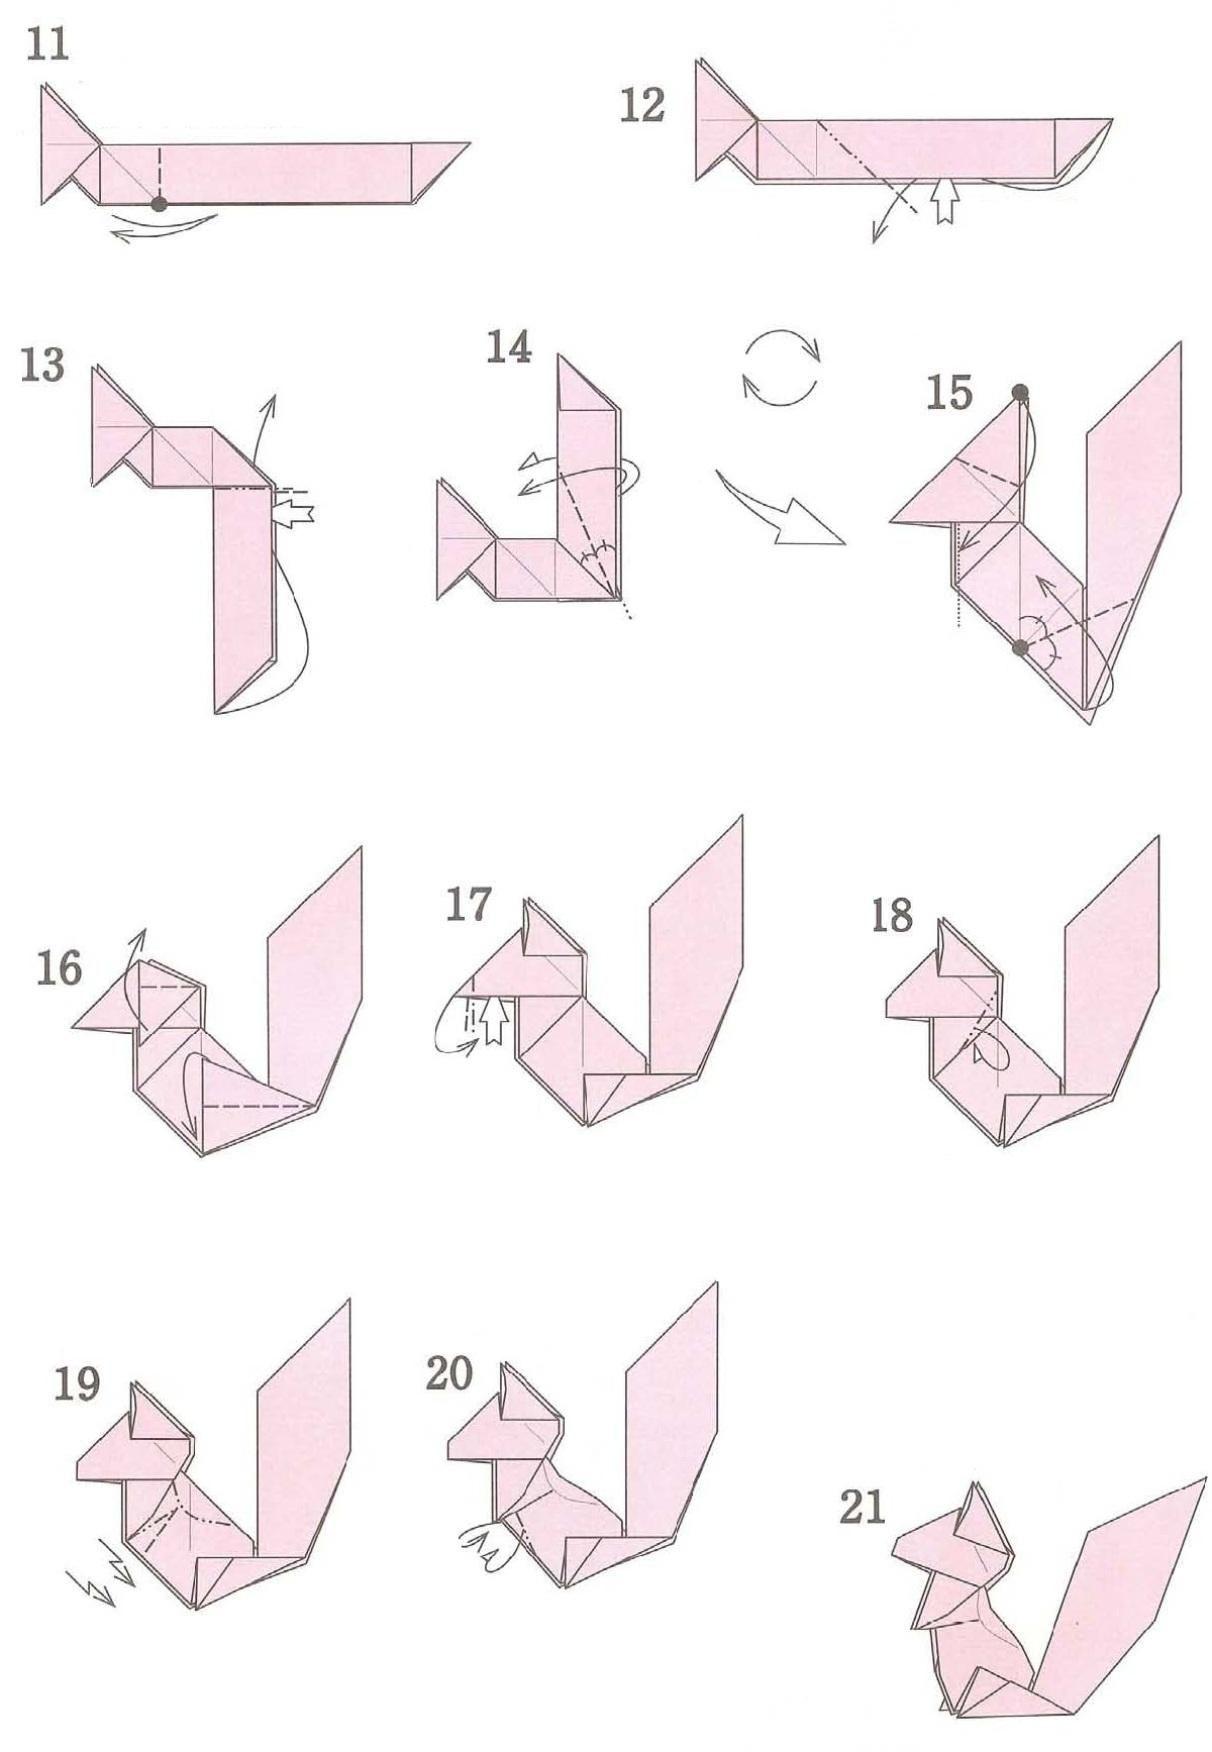 pin von jill hadley auf origami pinterest origami origami anleitungen und origami f r anf nger. Black Bedroom Furniture Sets. Home Design Ideas